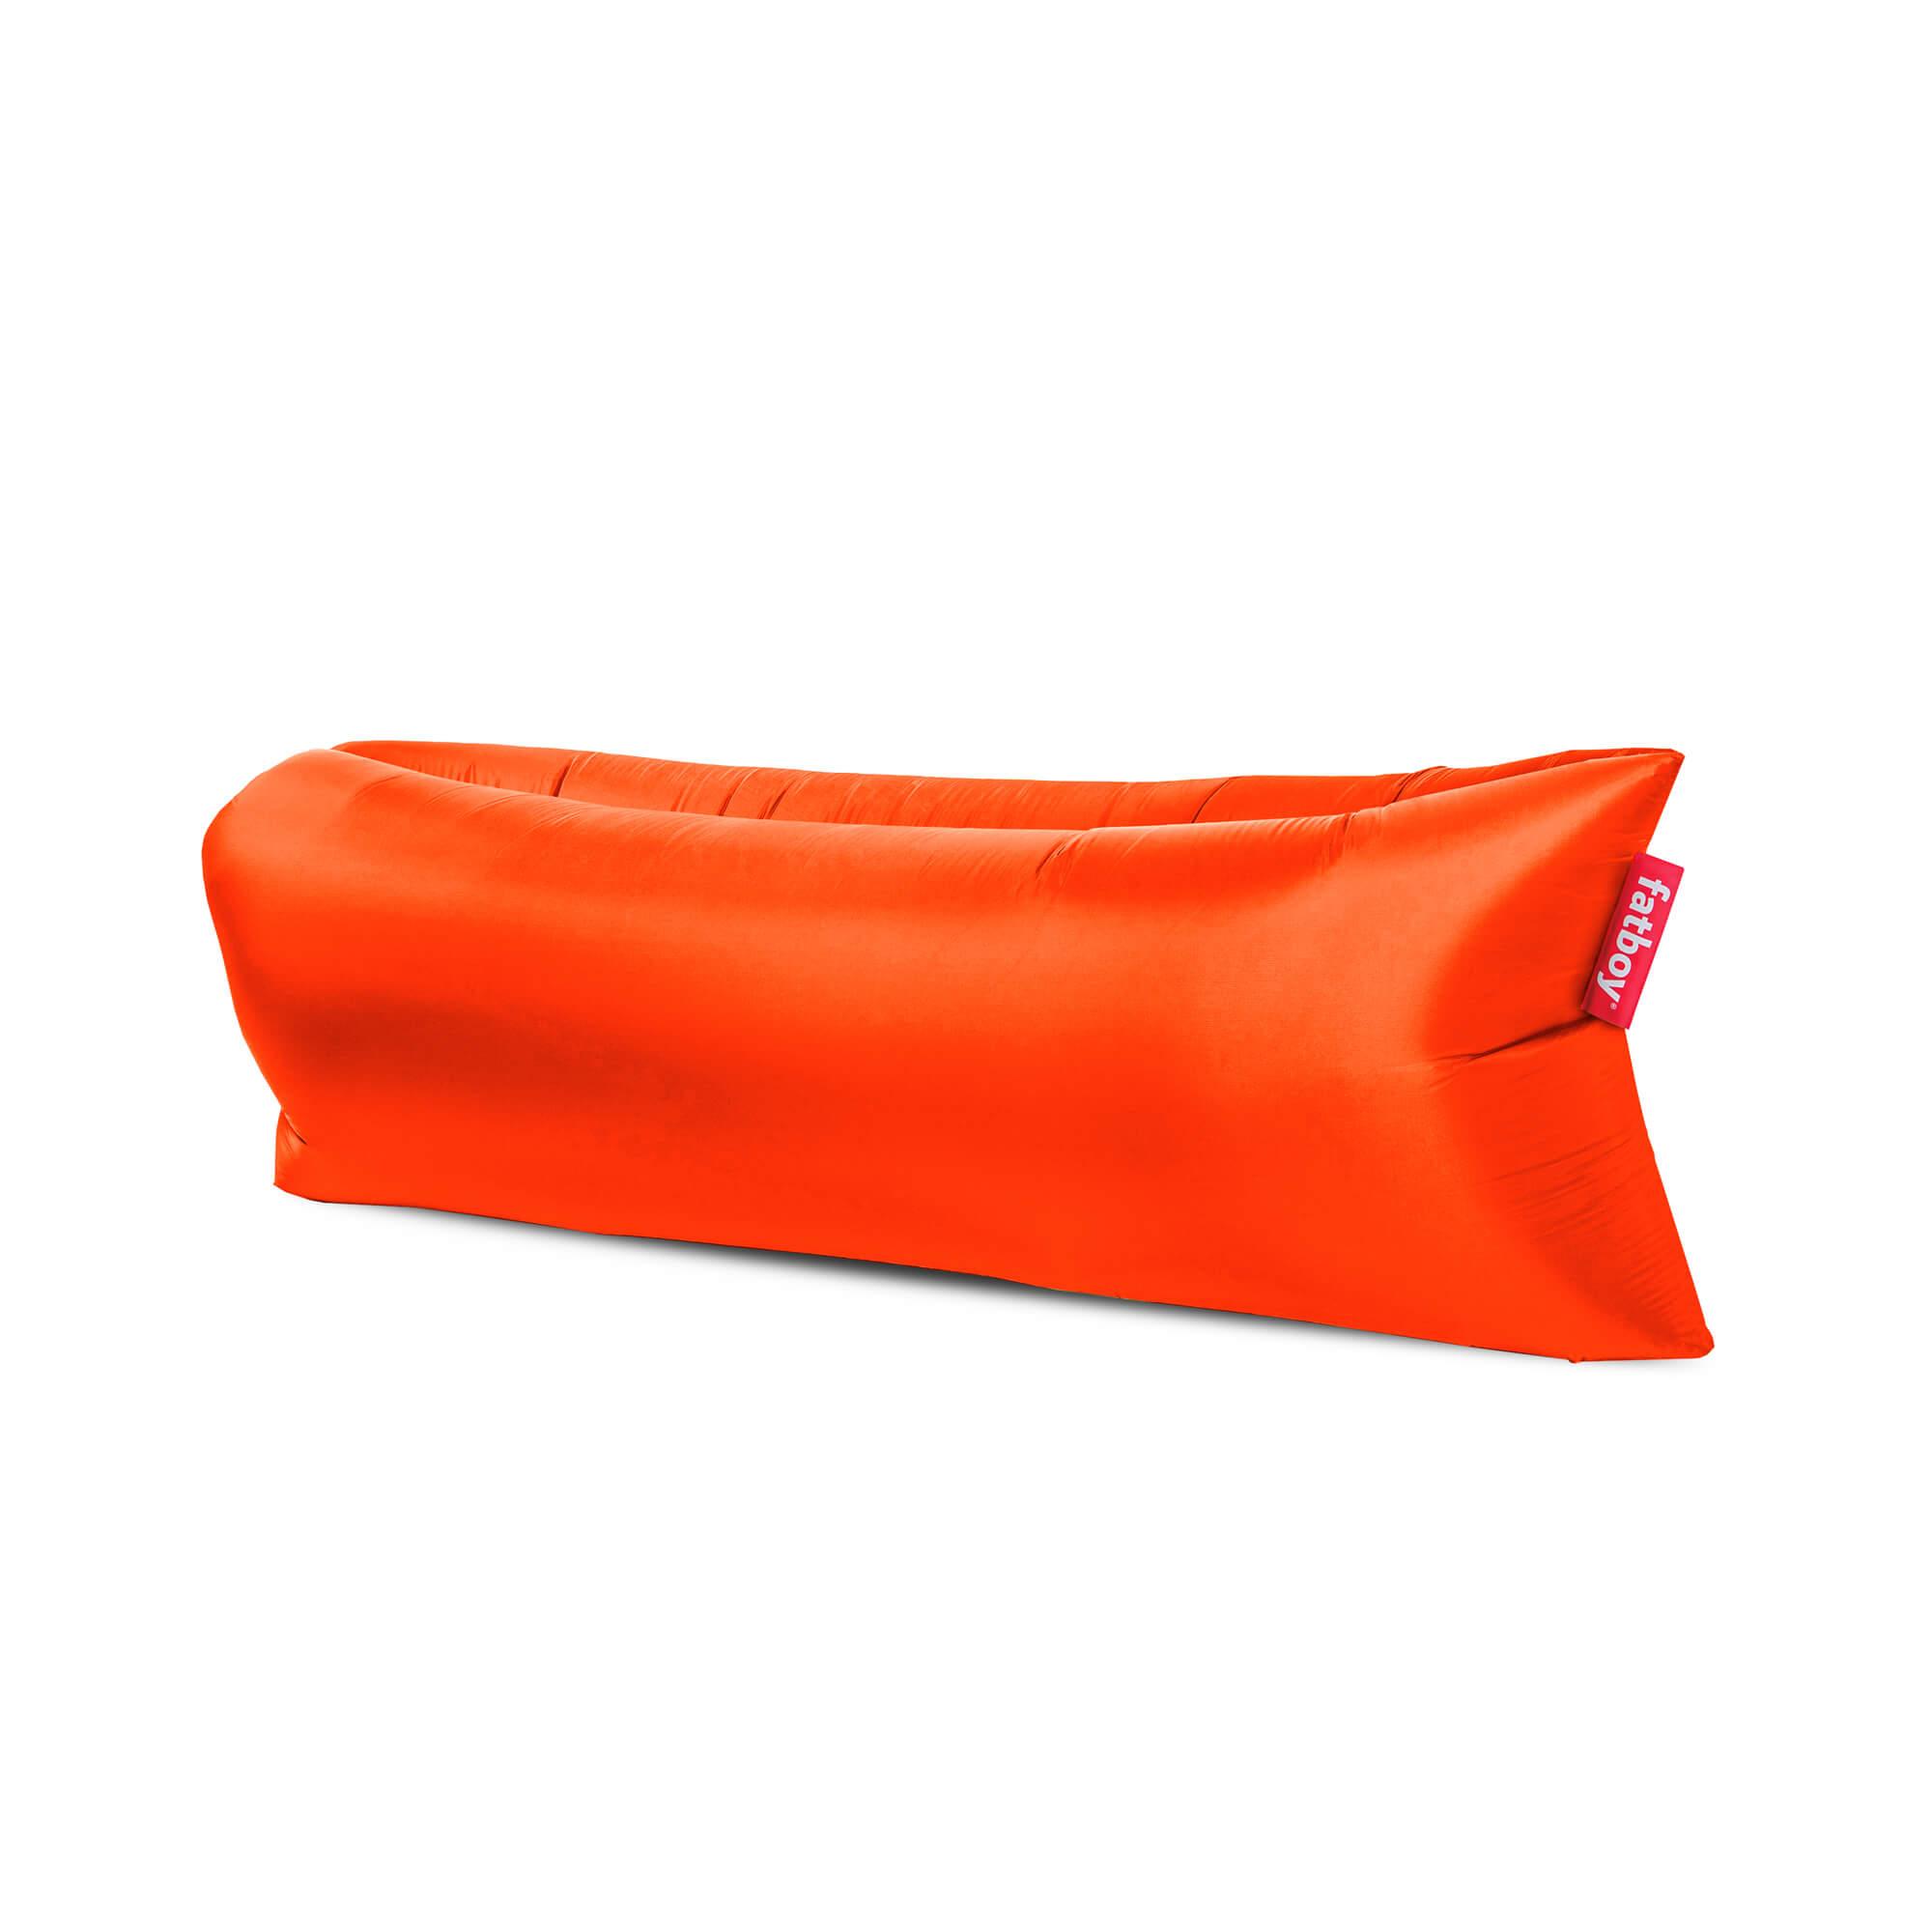 fatboy Aufblasbares Luftsofa Lamzac 3 Tulip Orange